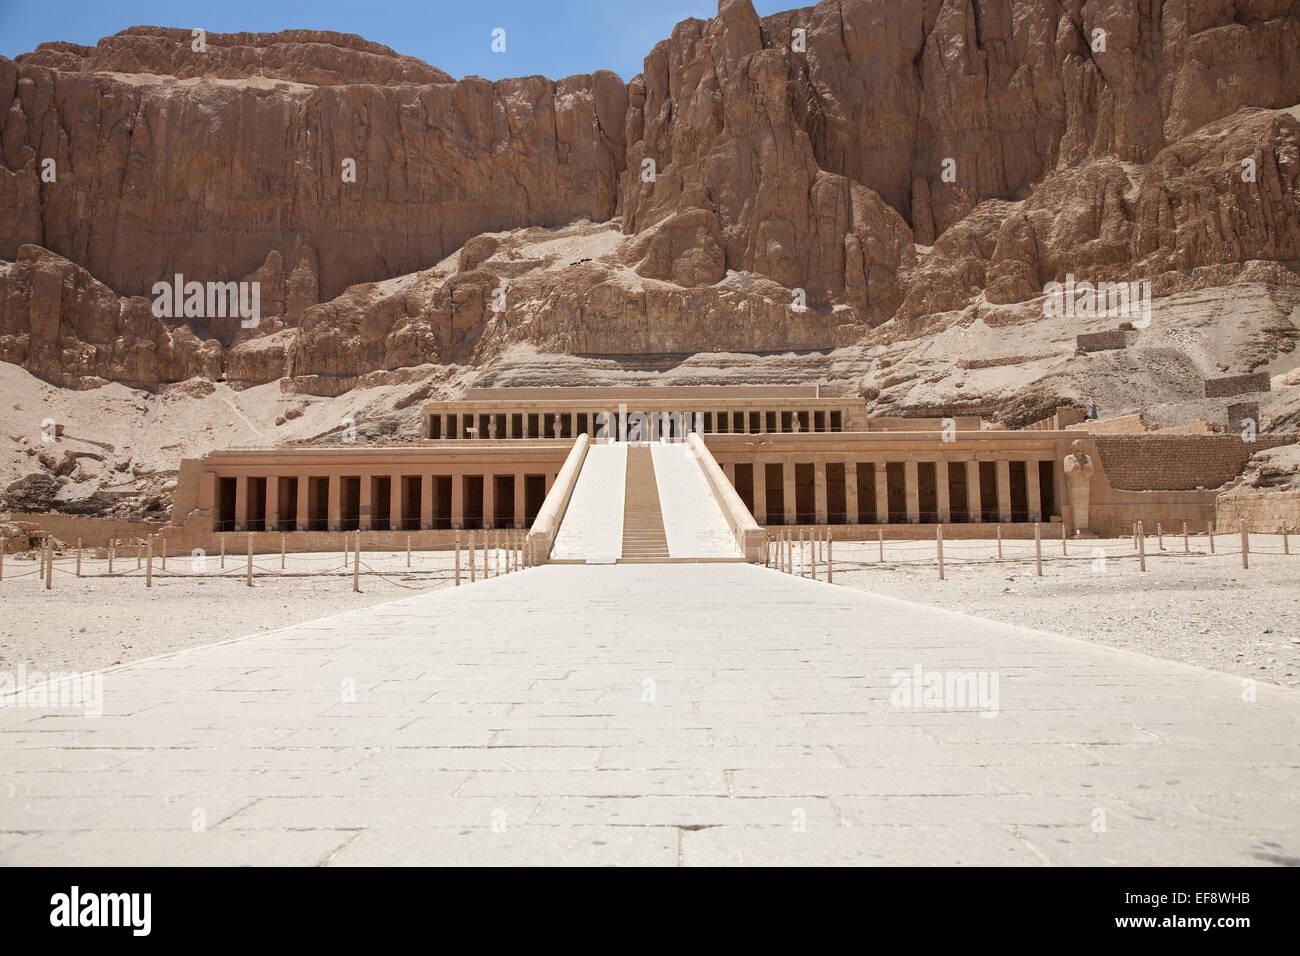 Hatchepsut temple in Luxor, Egypt - Stock Image